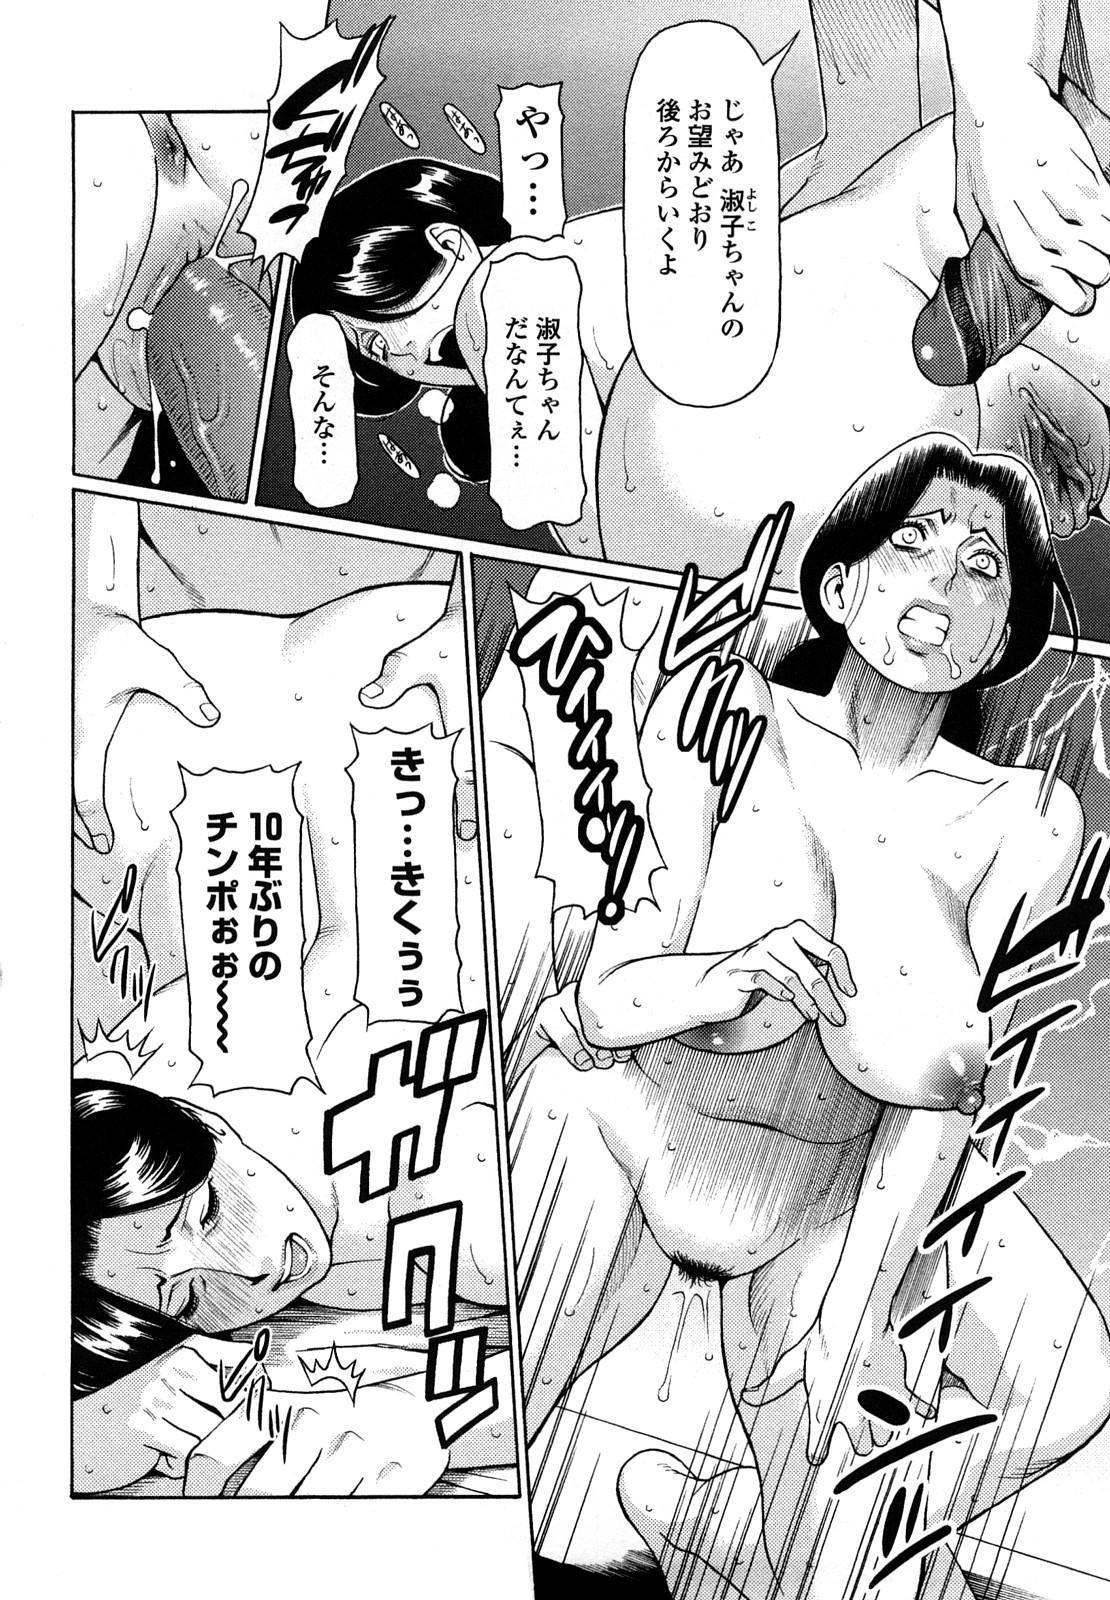 [Takasugi Kou] Kindan no Haha-Ana - Immorality Love-Hole [Decensored] 131